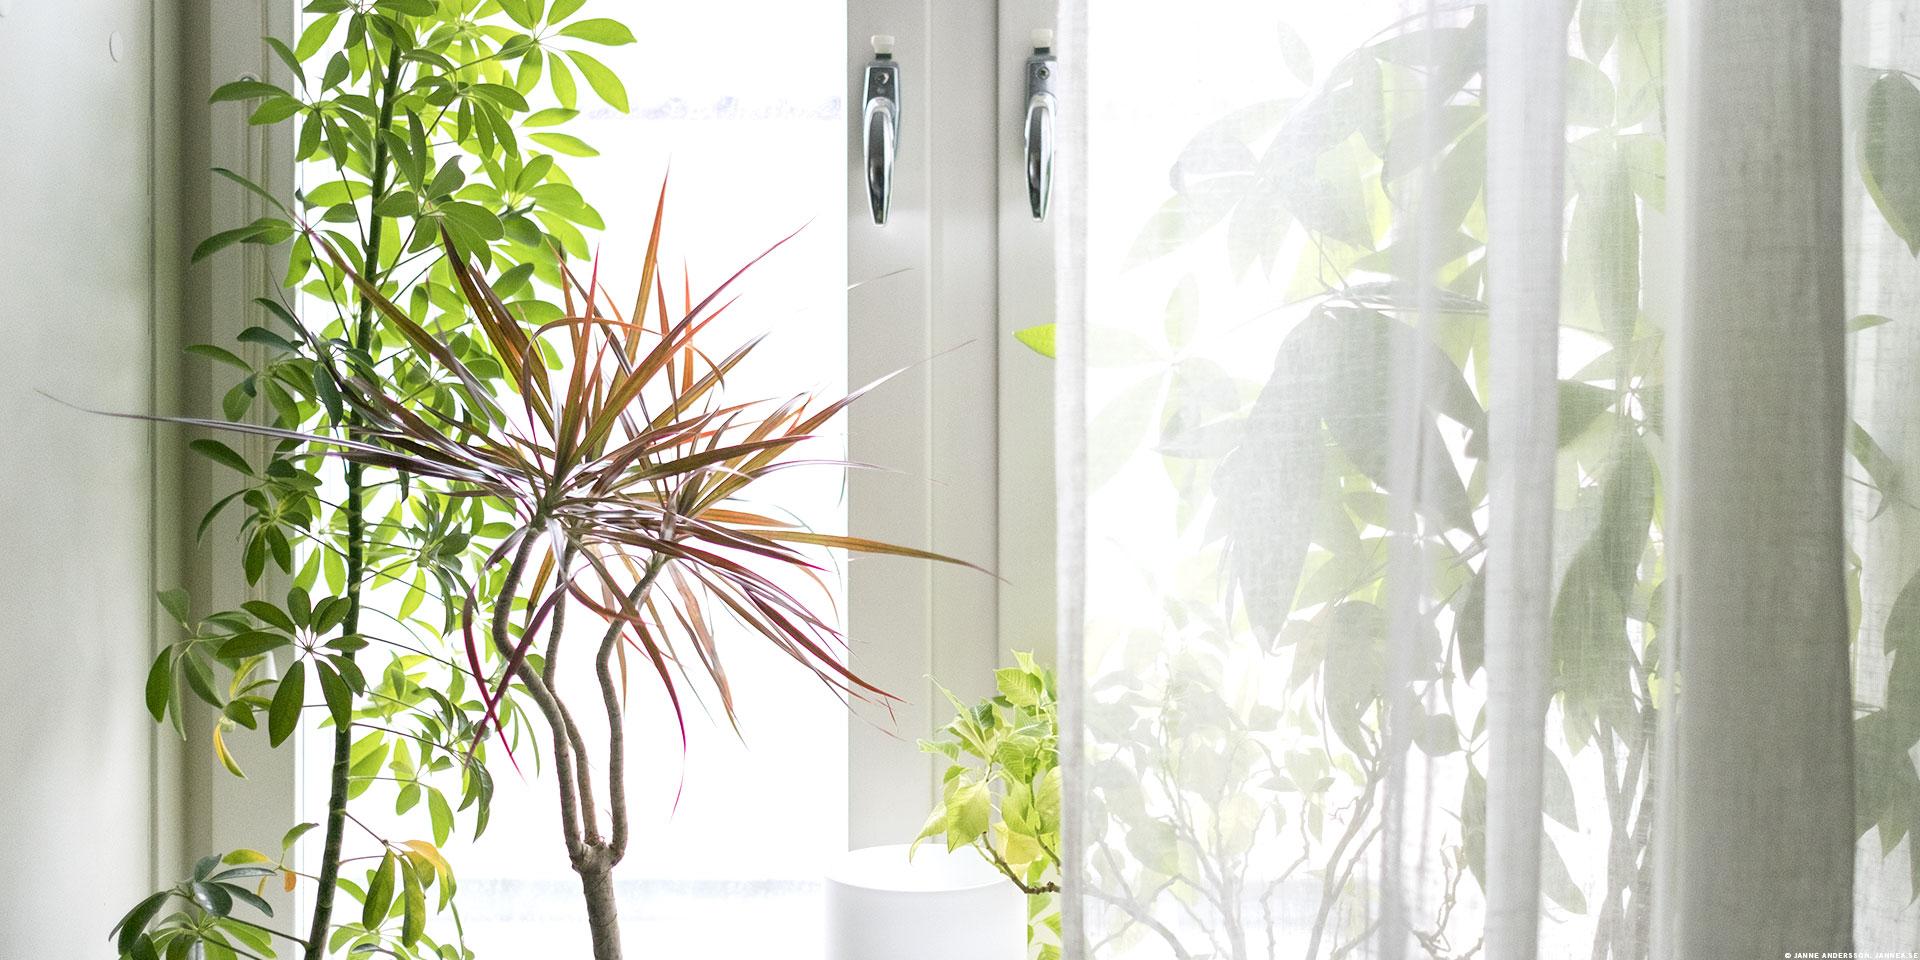 Mina krukväxter i fönstren mår inte så bra |©Janne A